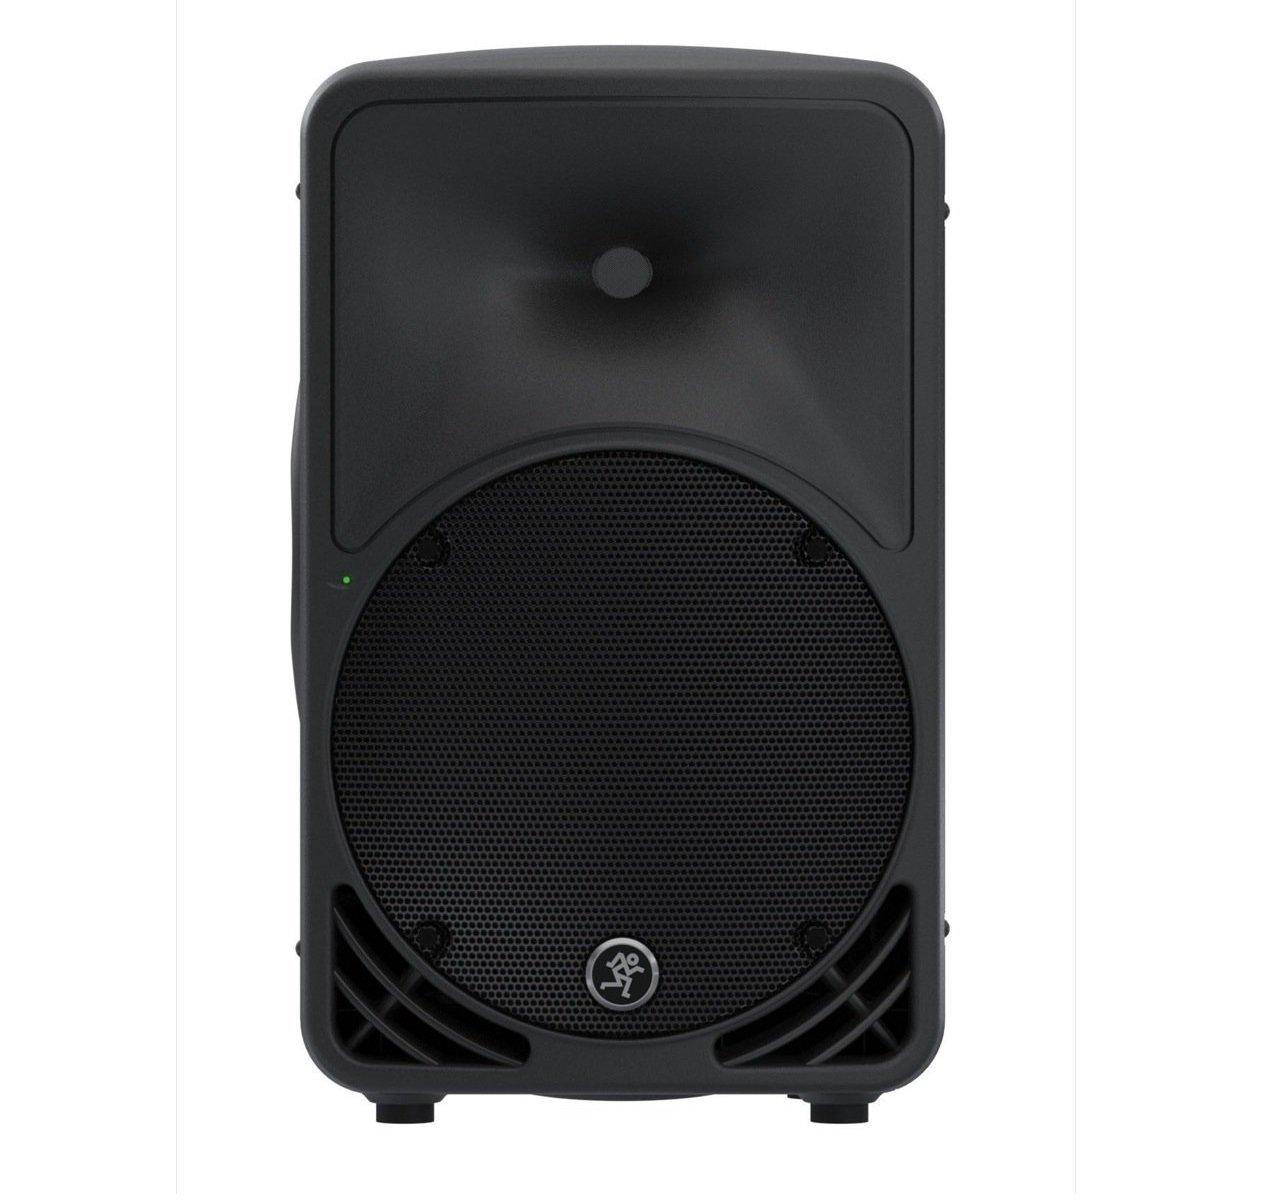 Mackie SRM350v3 1000W Powered Speaker